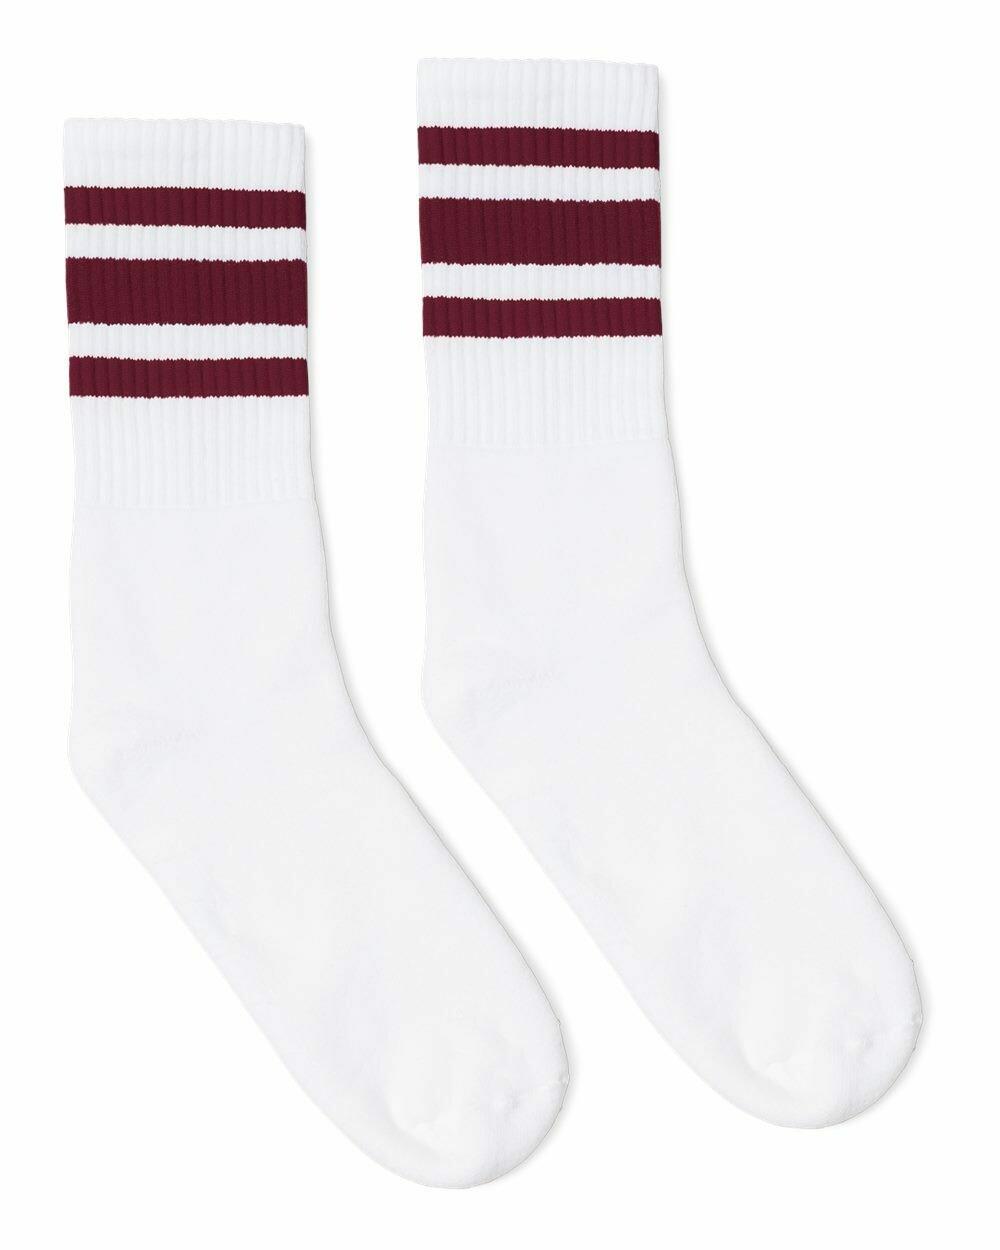 St. James Saints Striped Crew Socks - White/Maroon (PAIR)